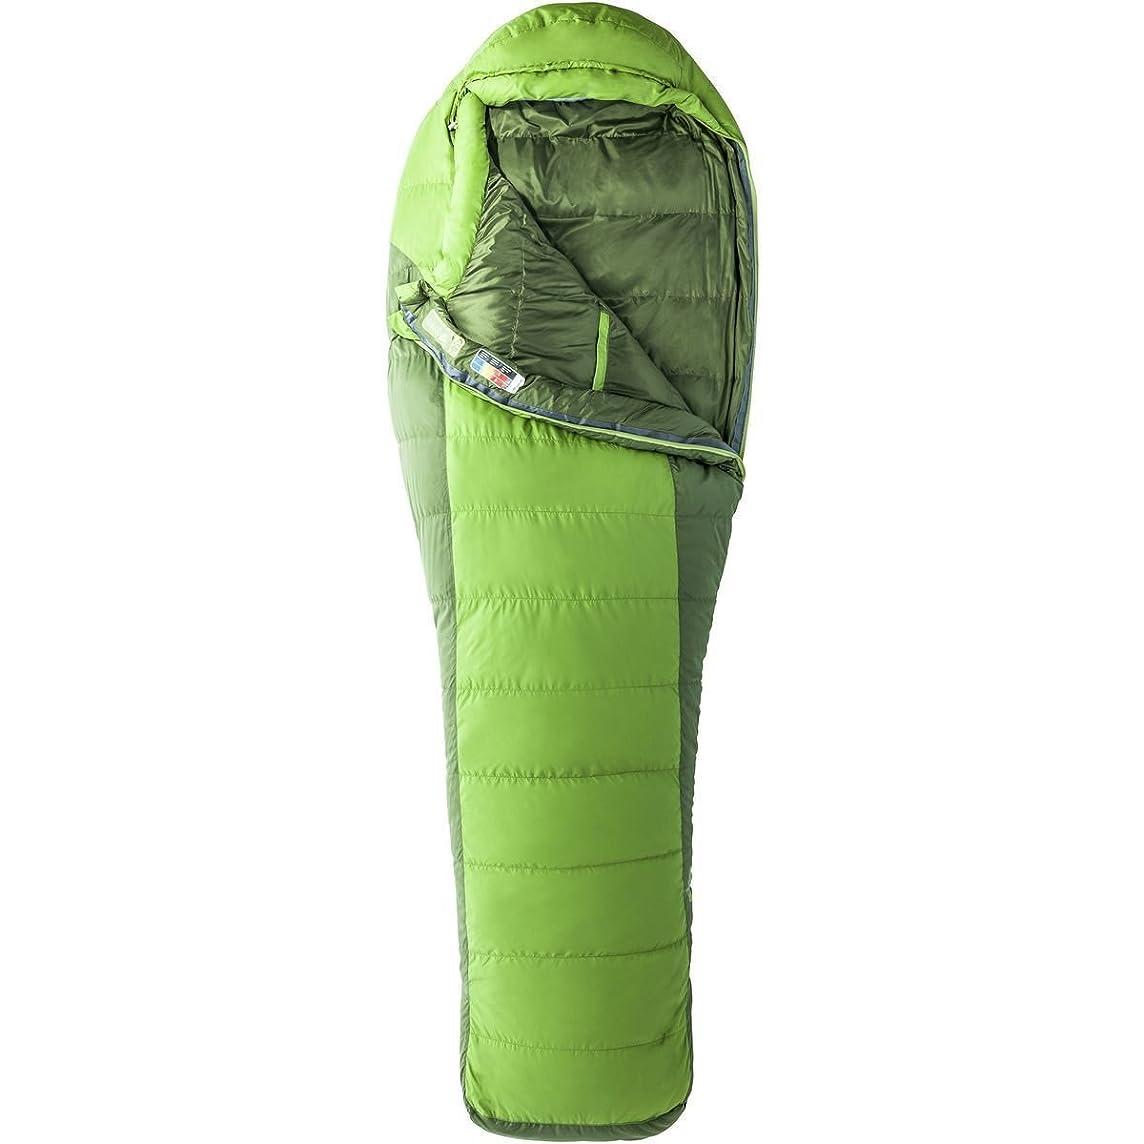 Marmot Never Winter Sleeping Bag: 30-Degree Down Cilantro/Tree Green, Reg/Right Zip